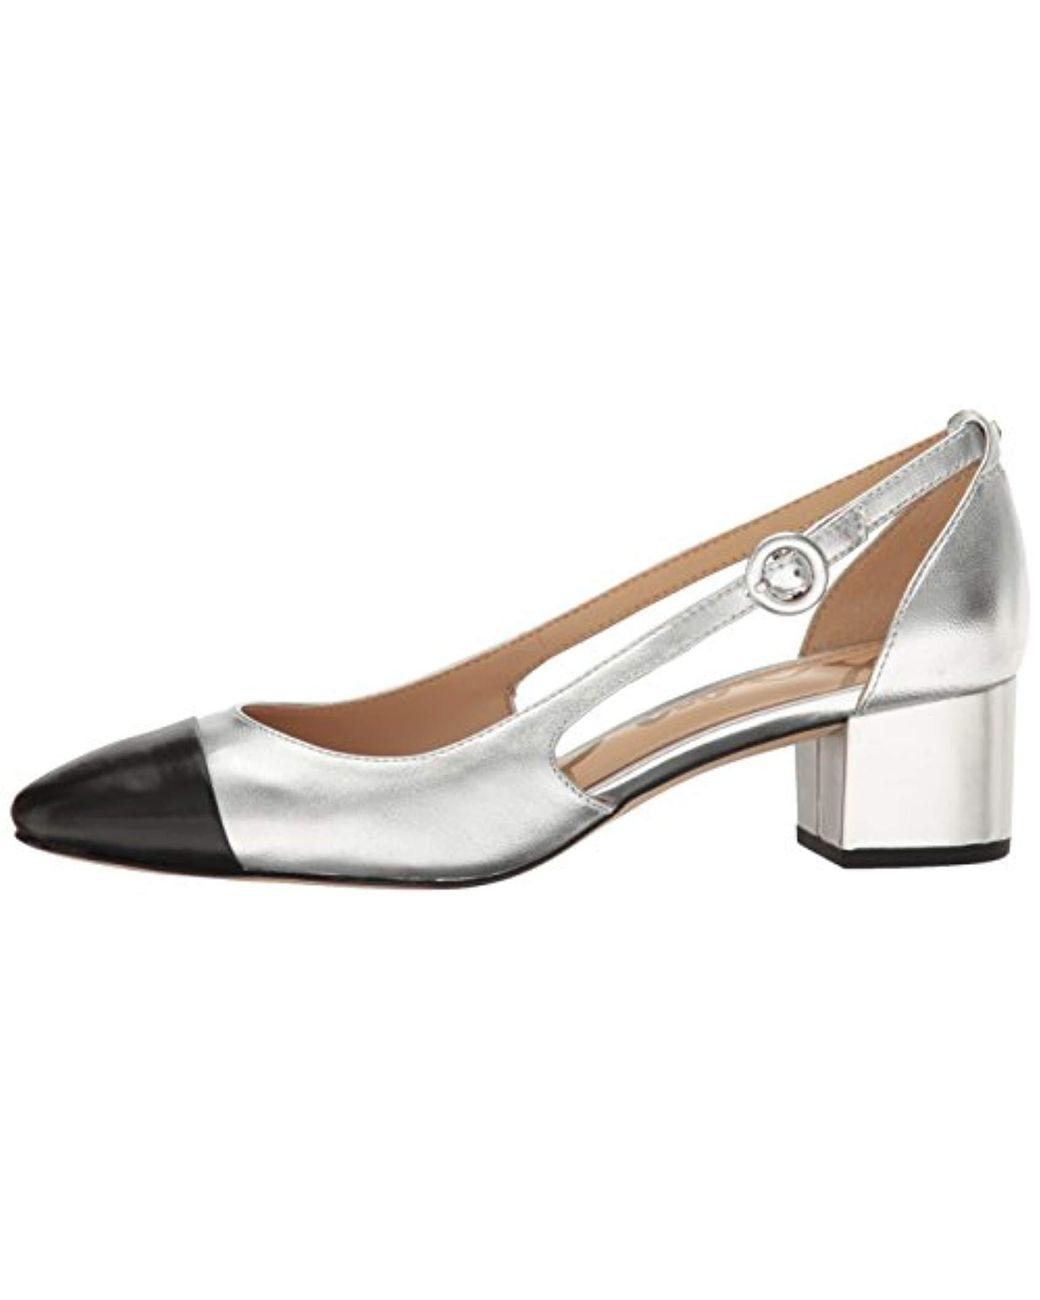 95501f148e5 Lyst - Sam Edelman Leah Cutout Block Heel in Metallic - Save 24%